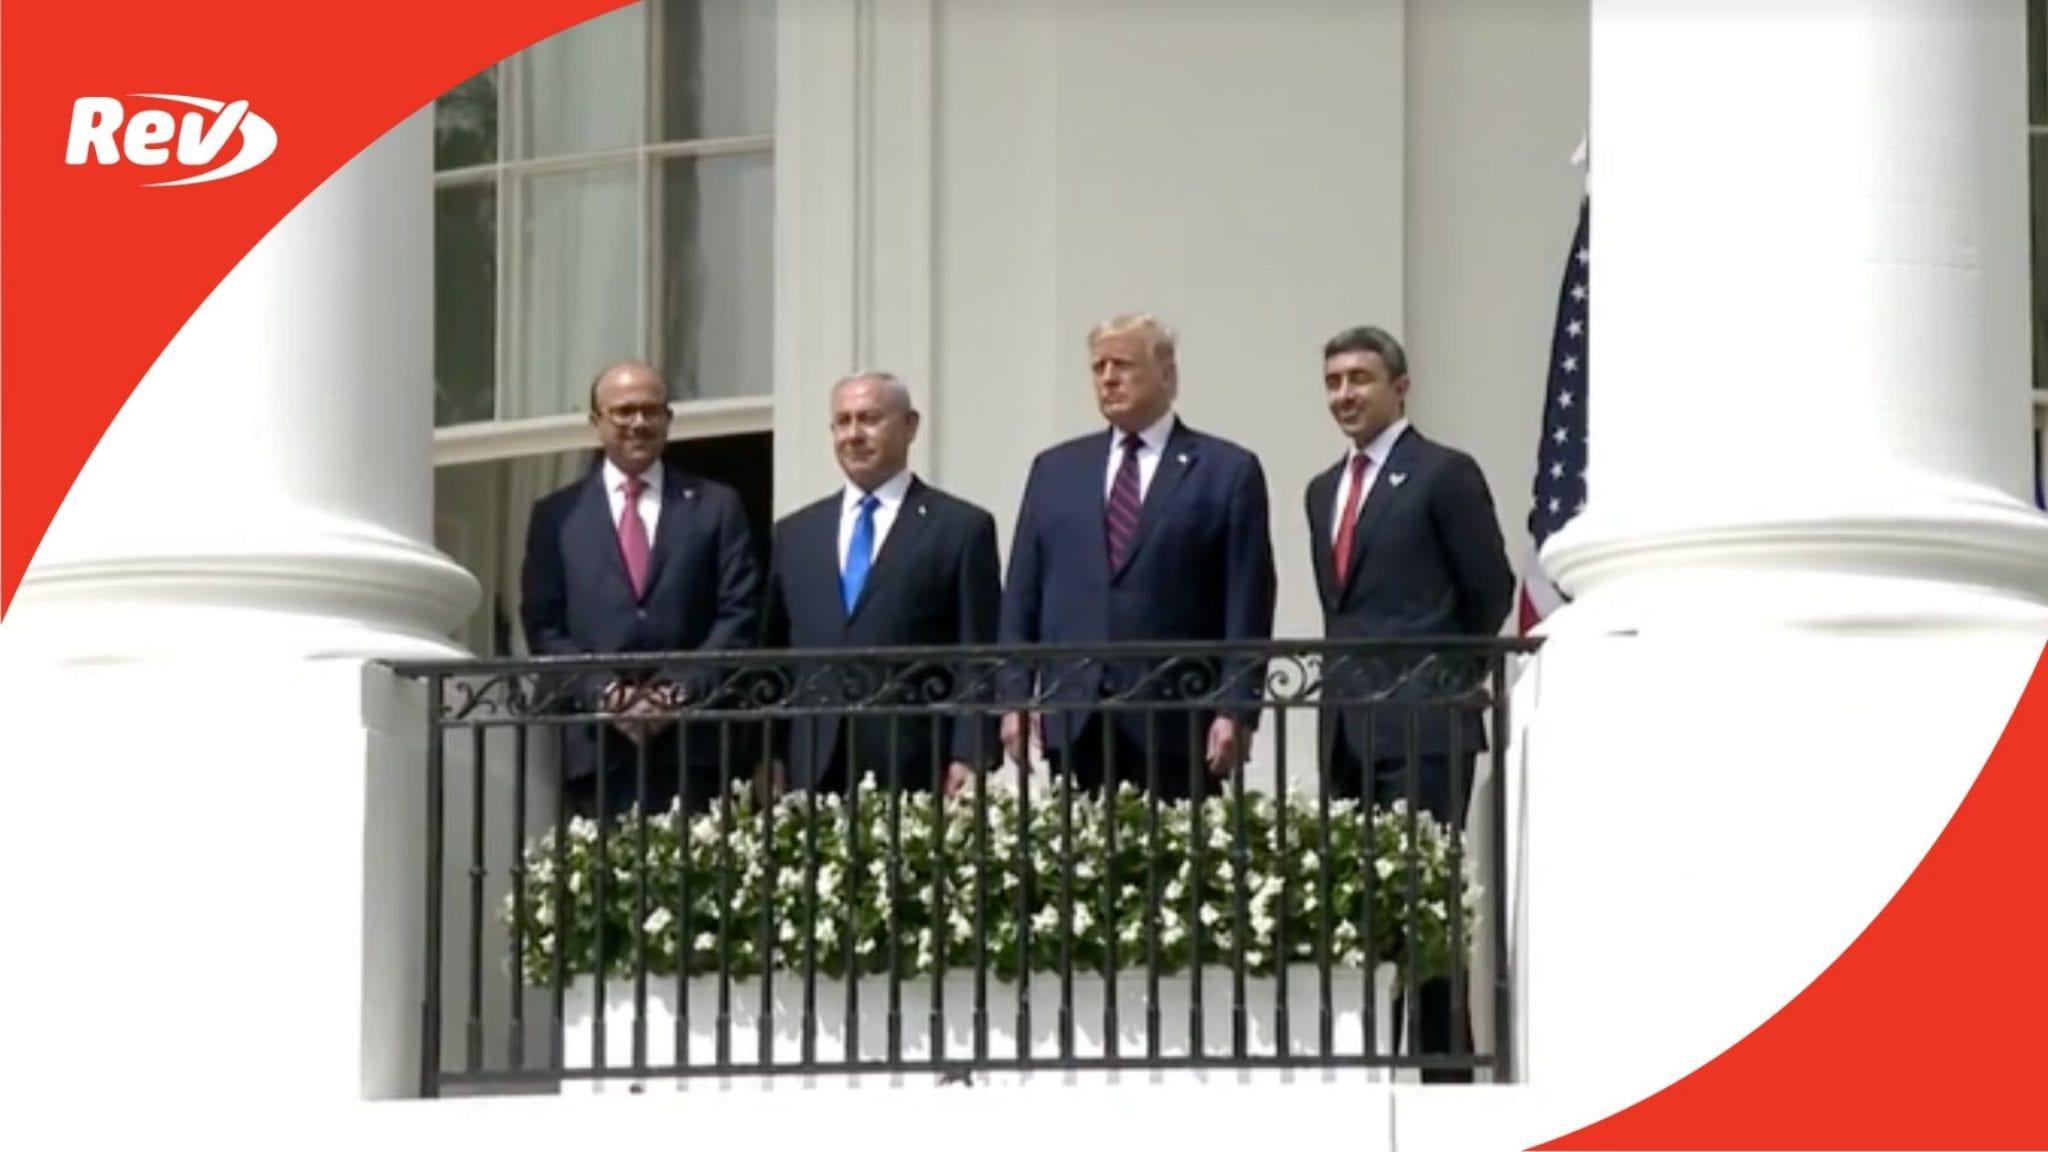 Abraham Accords Signing Ceremony Transcript September 15